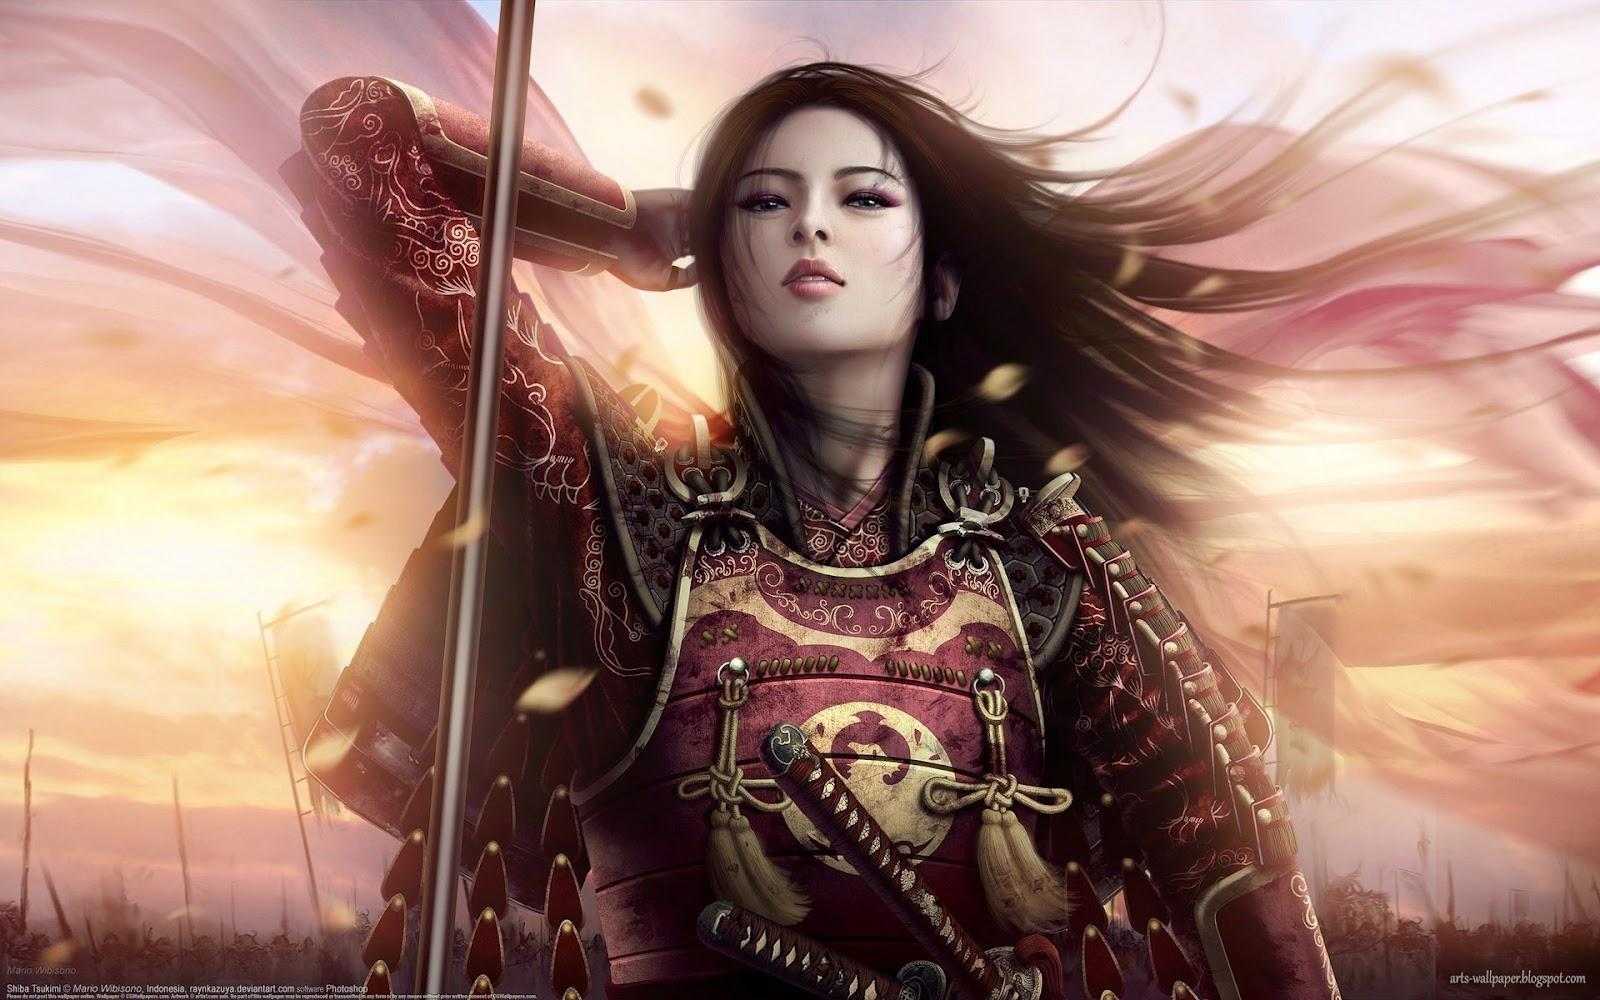 Cg art wallpaper mario wibisono artwork 13 arts wallpaper - Fantasy female warrior artwork ...